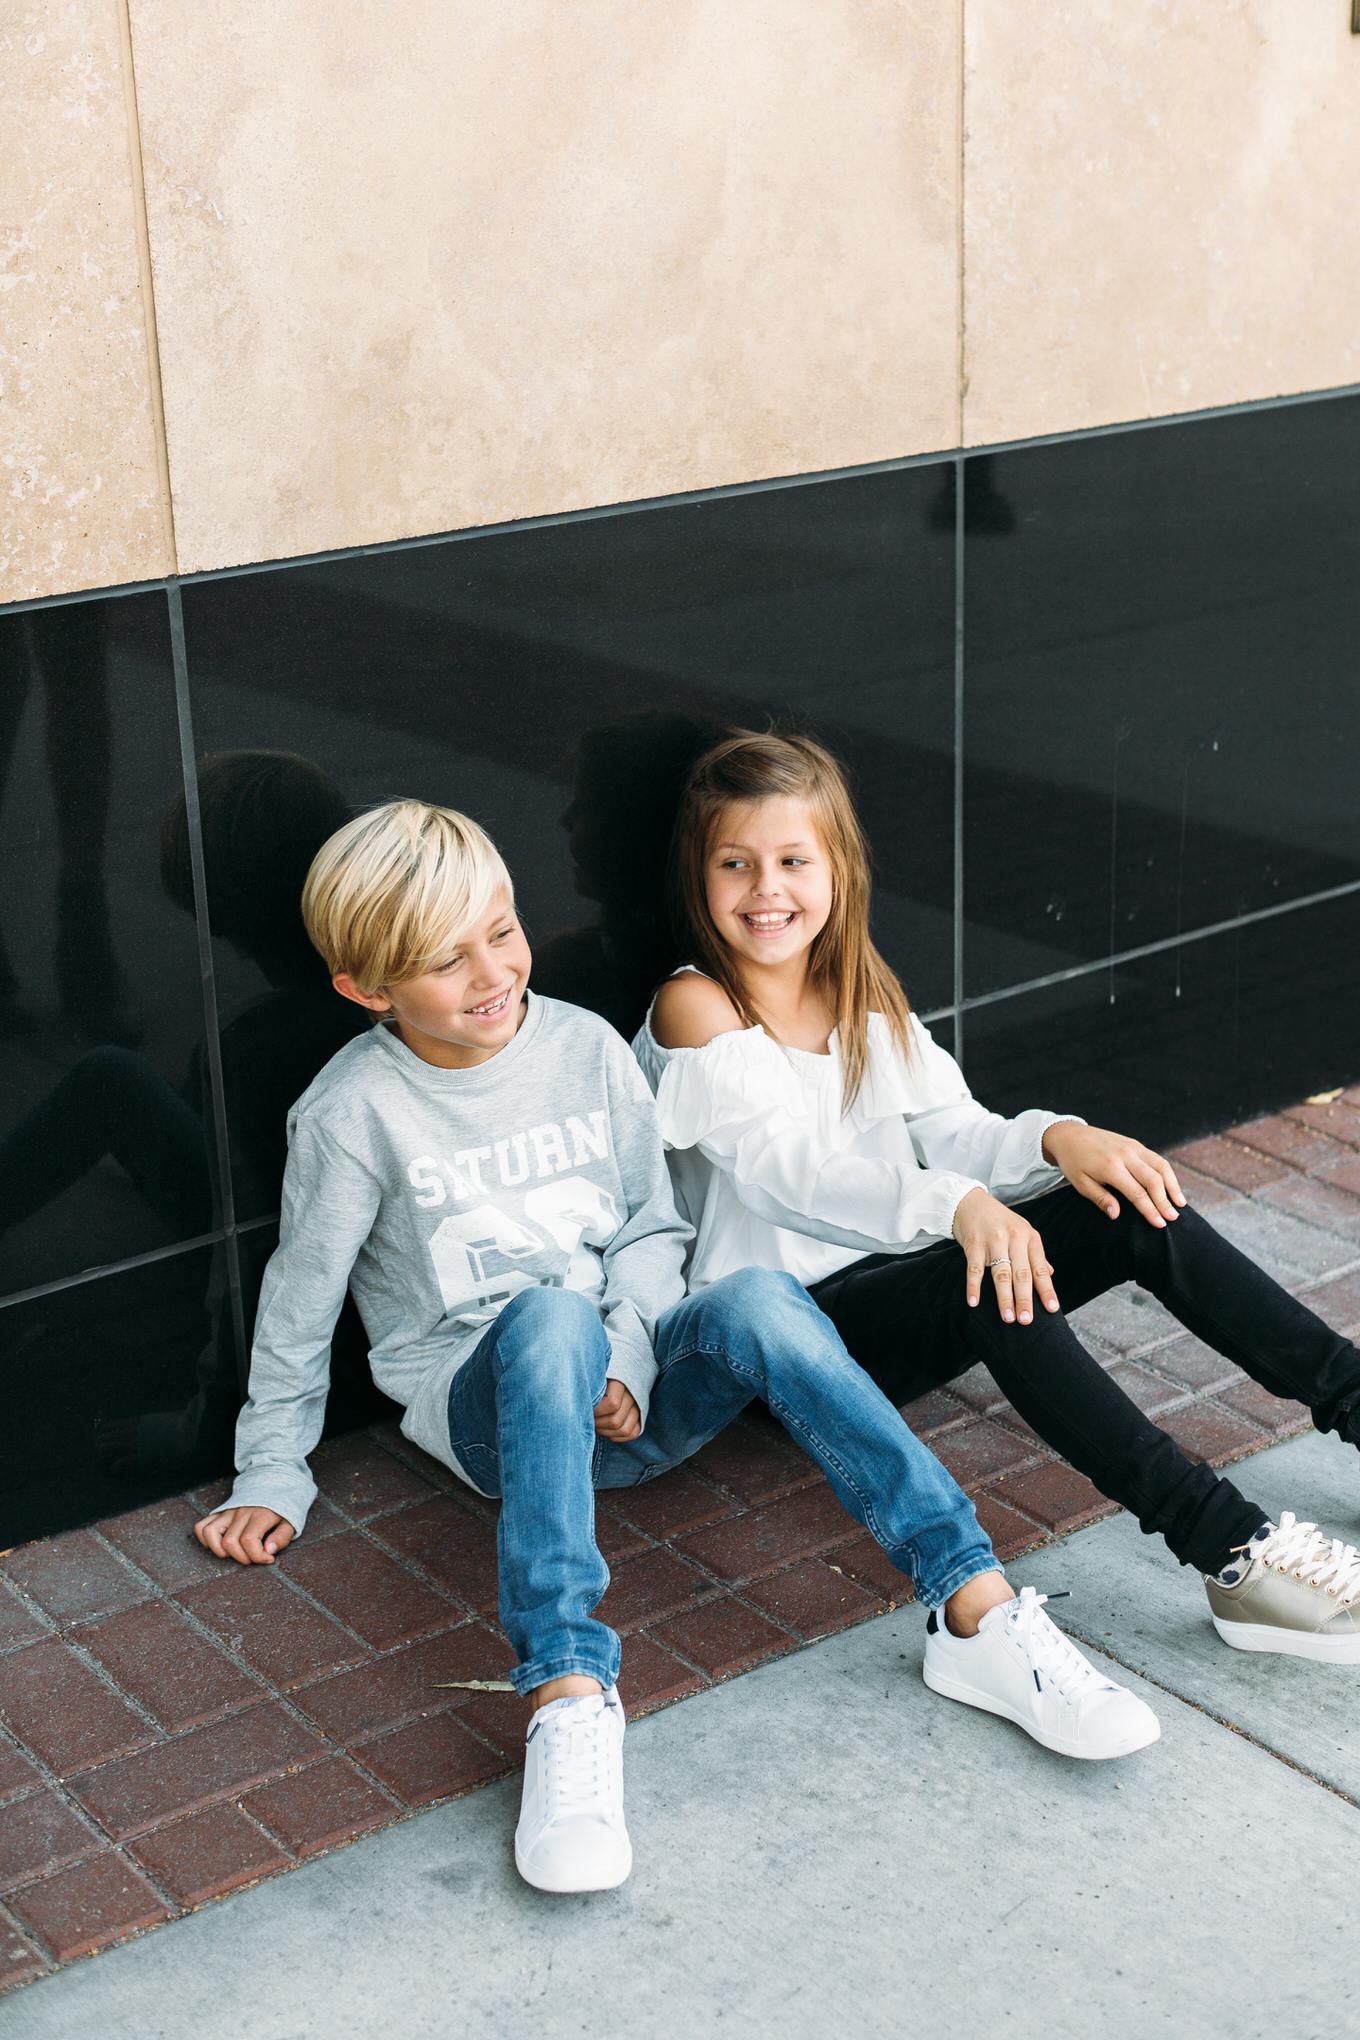 h&M kids style